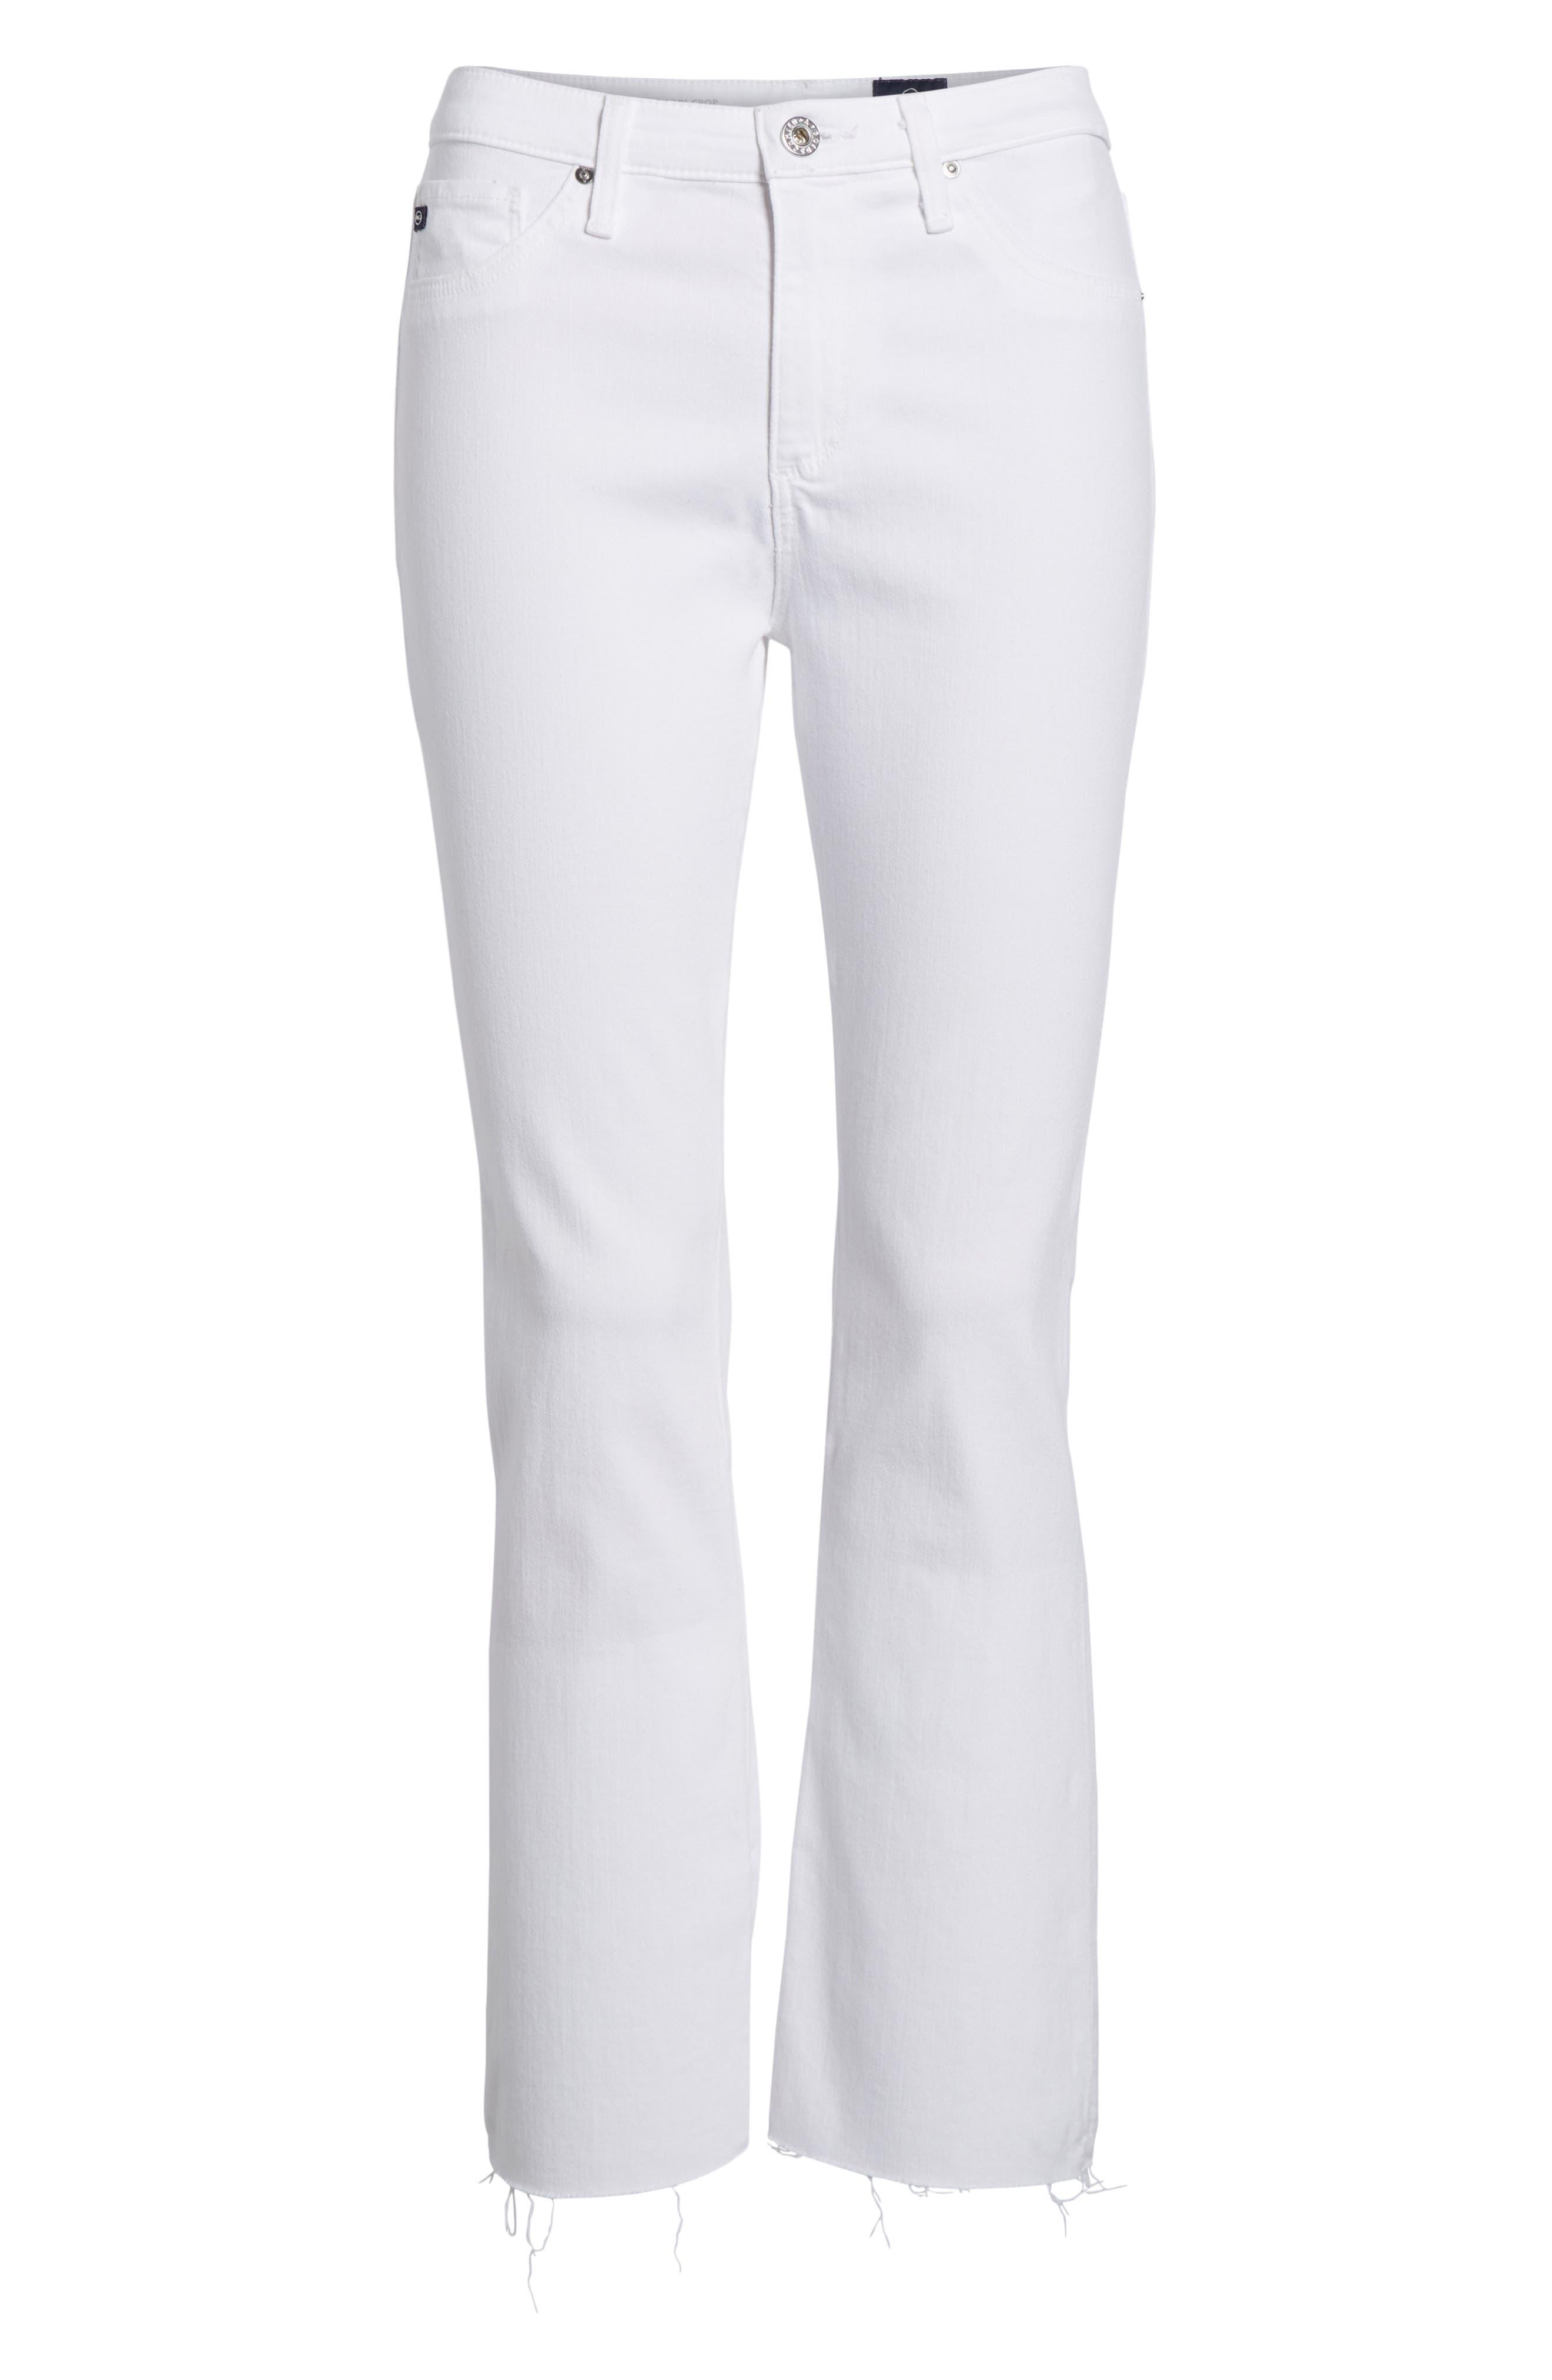 Jodi High Waist Crop Jeans,                             Alternate thumbnail 7, color,                             110